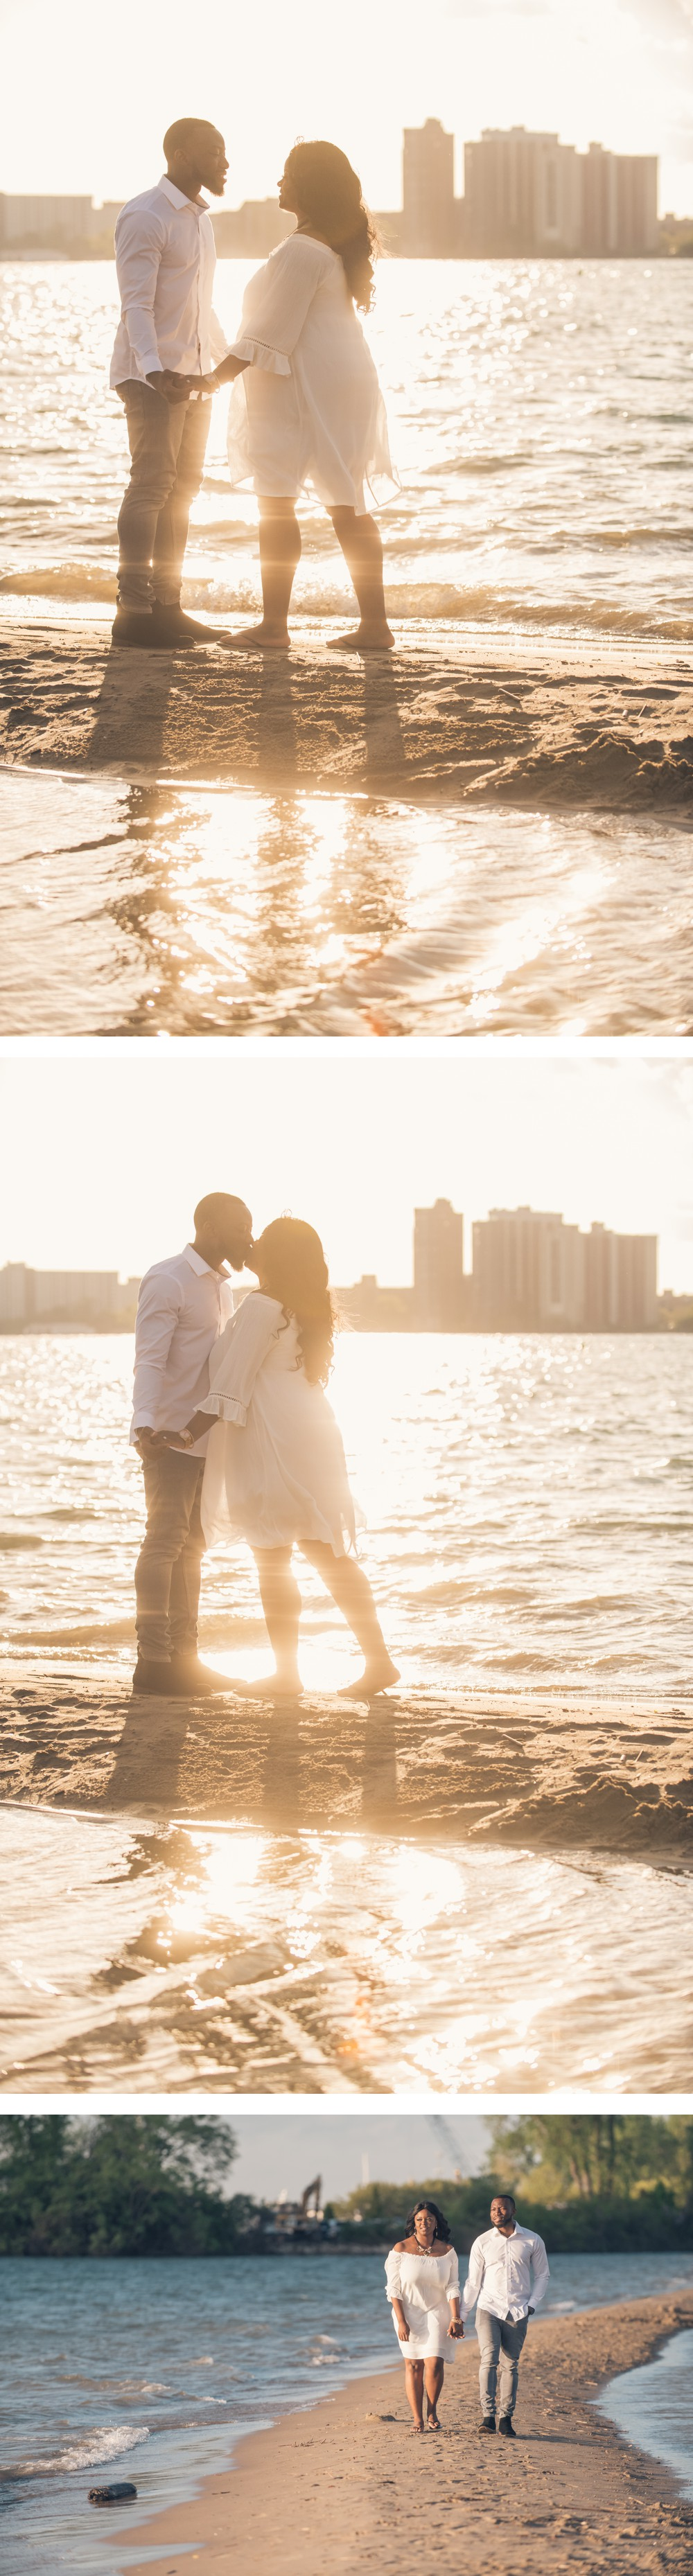 Moe + Dayo Engagement 10.jpg